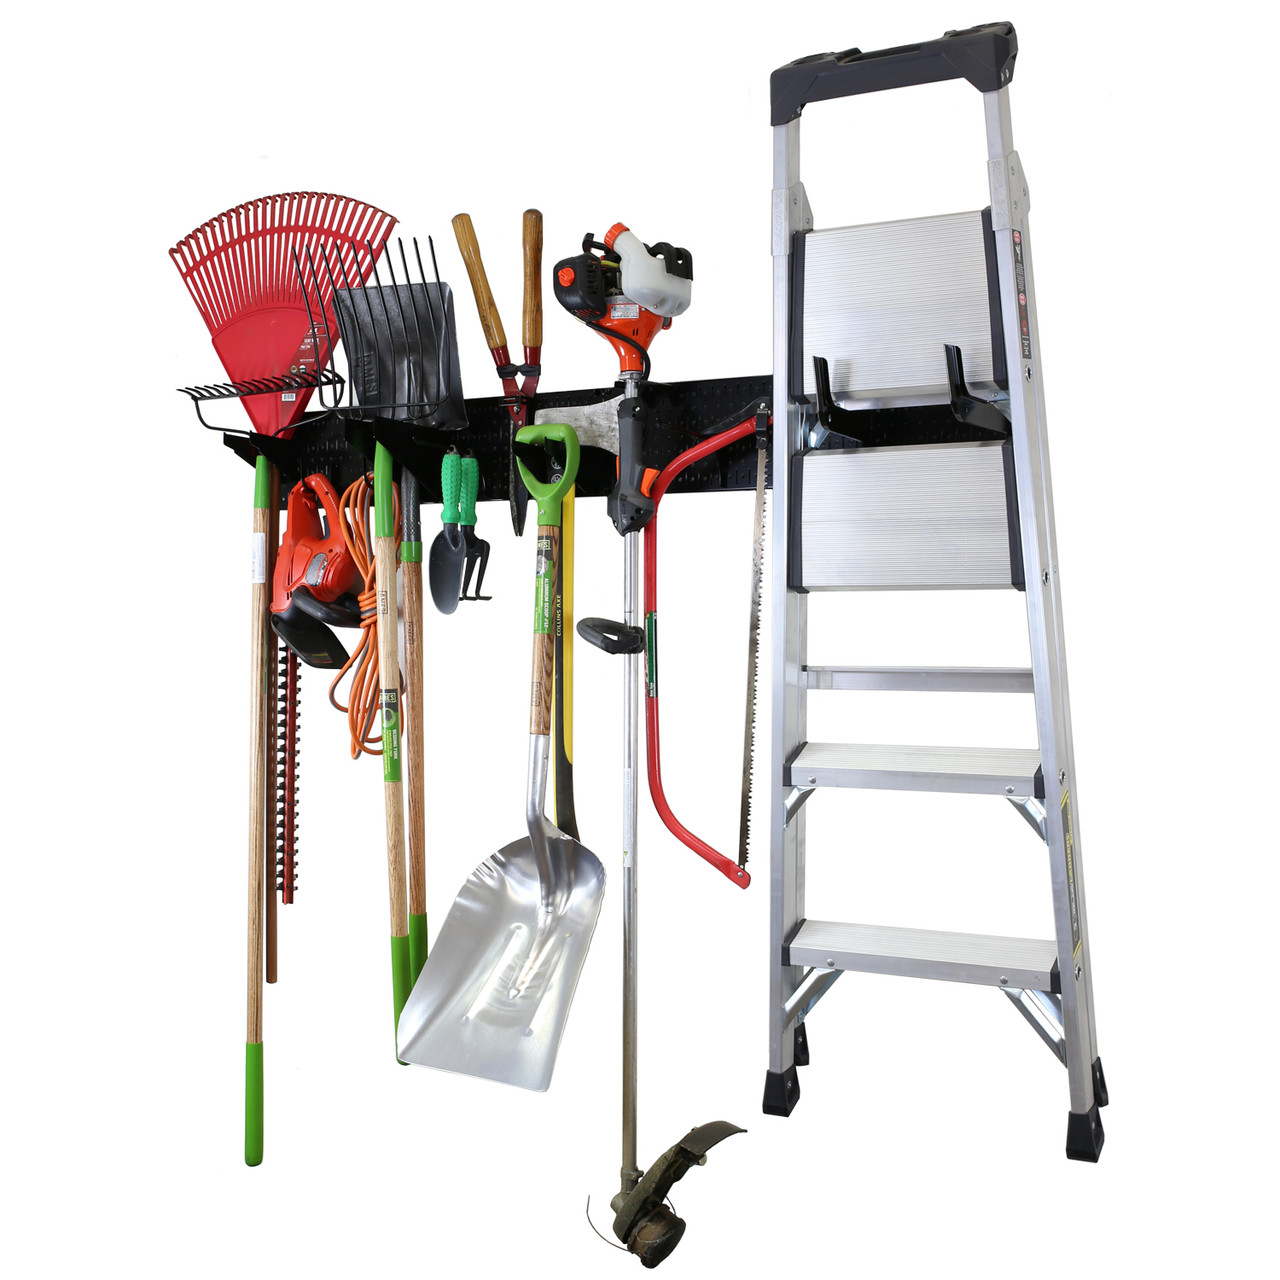 Garage Storage Lawn Garden Black Tool Organizer Rack Wall Control